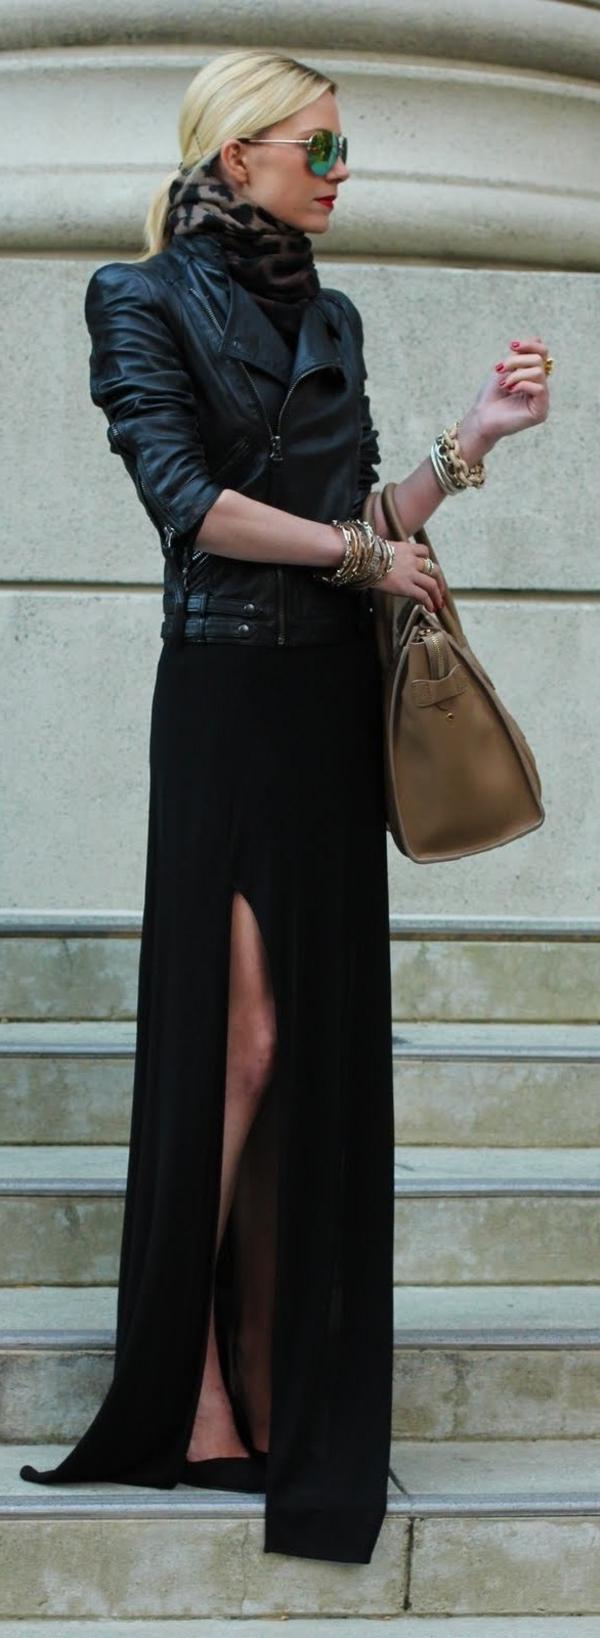 Tenue-de-jour-rock-s'habiller-bien-robe-longue